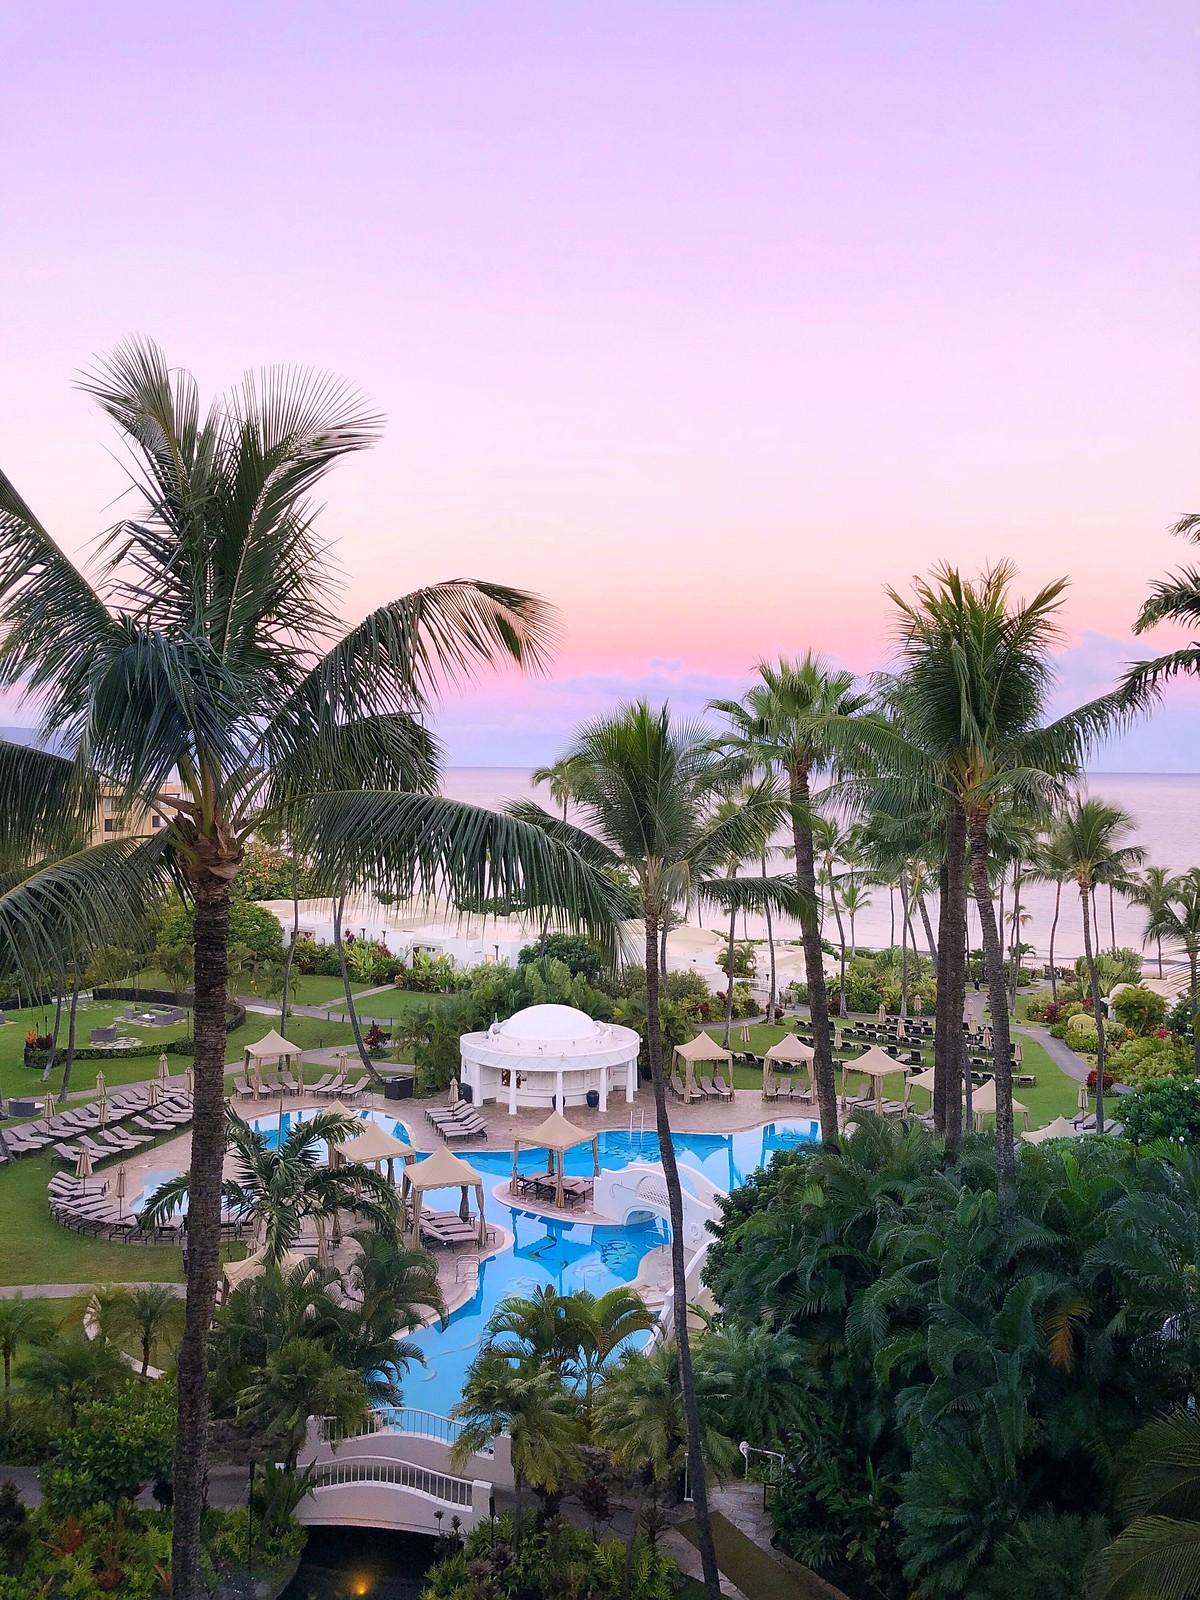 Sunrise Fairmont Kea Lani Best Hotel Maui